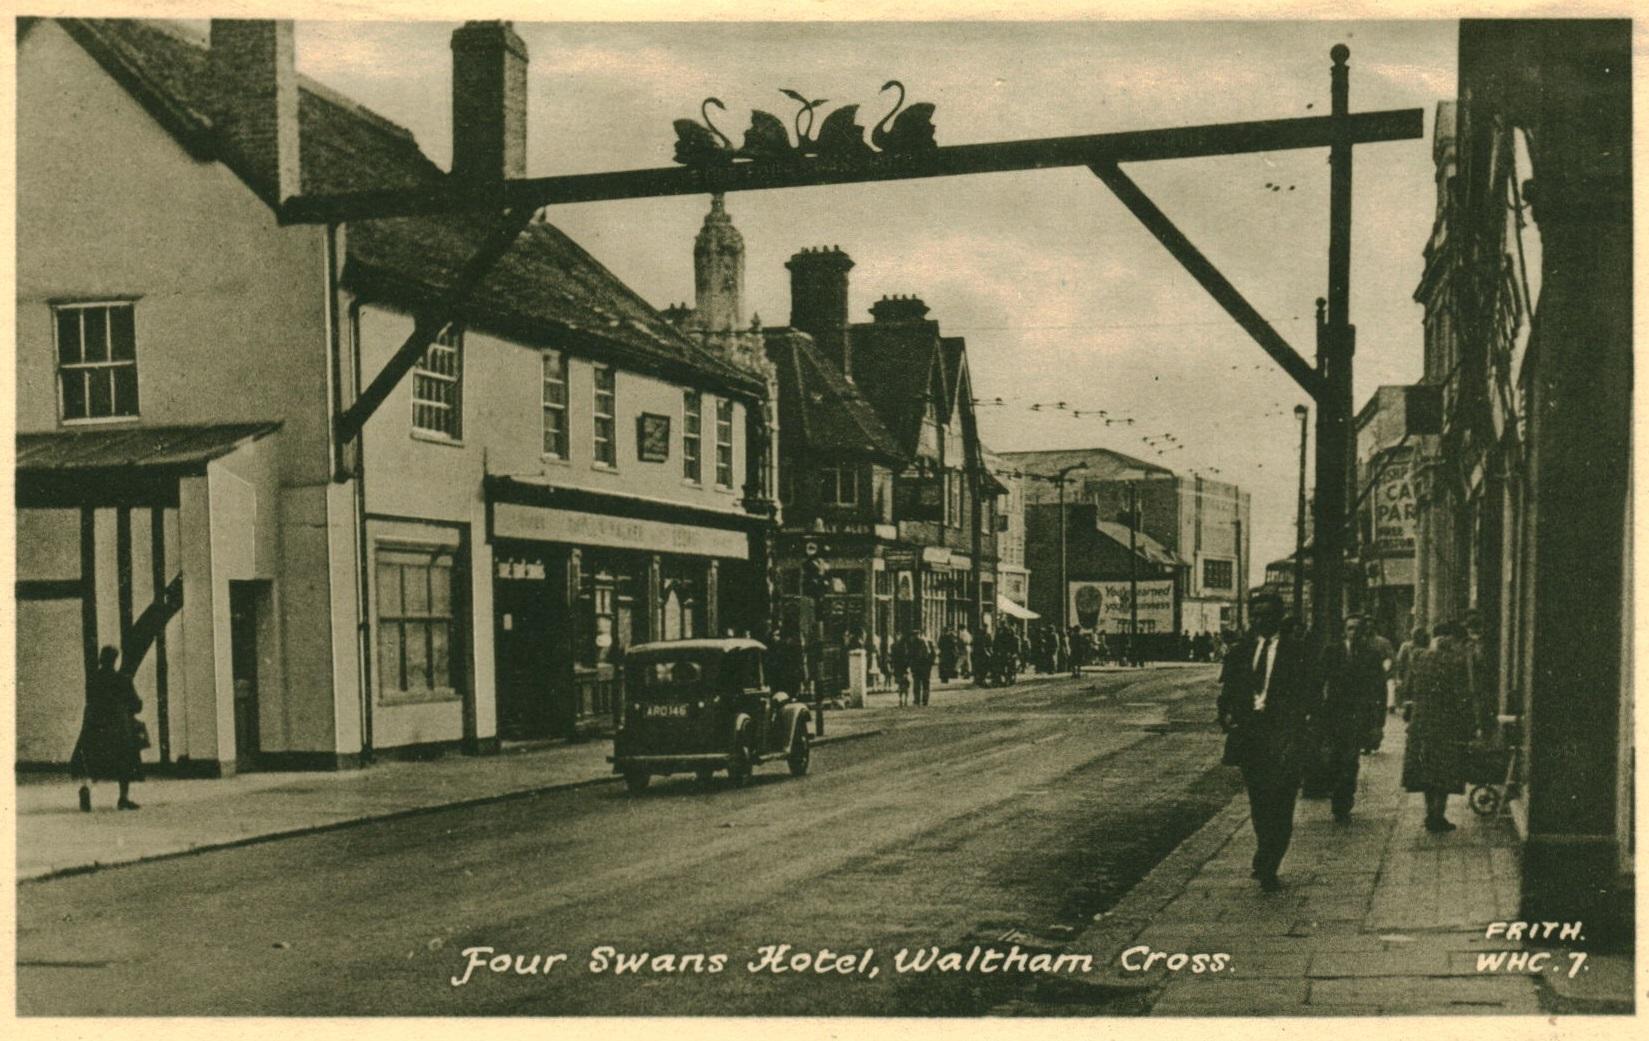 Waltham Cross Four Swans Hotel